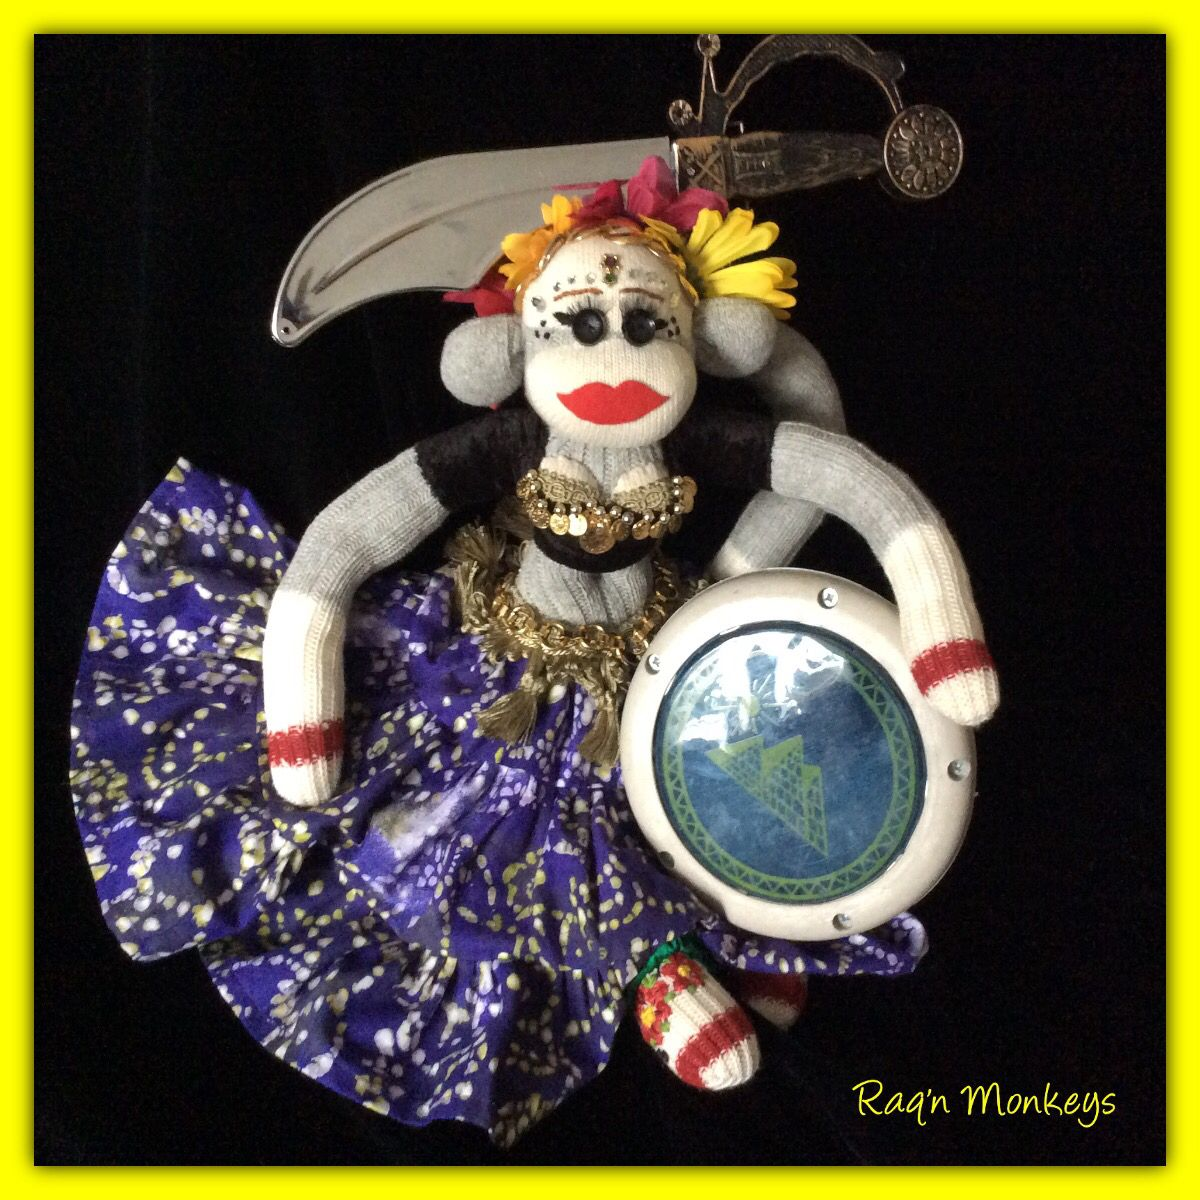 "Tribal Bellydance ""Brandi"" - created by Raq'n Monkeys Oct 2015  https://www.facebook.com/raqn.monkeys/"